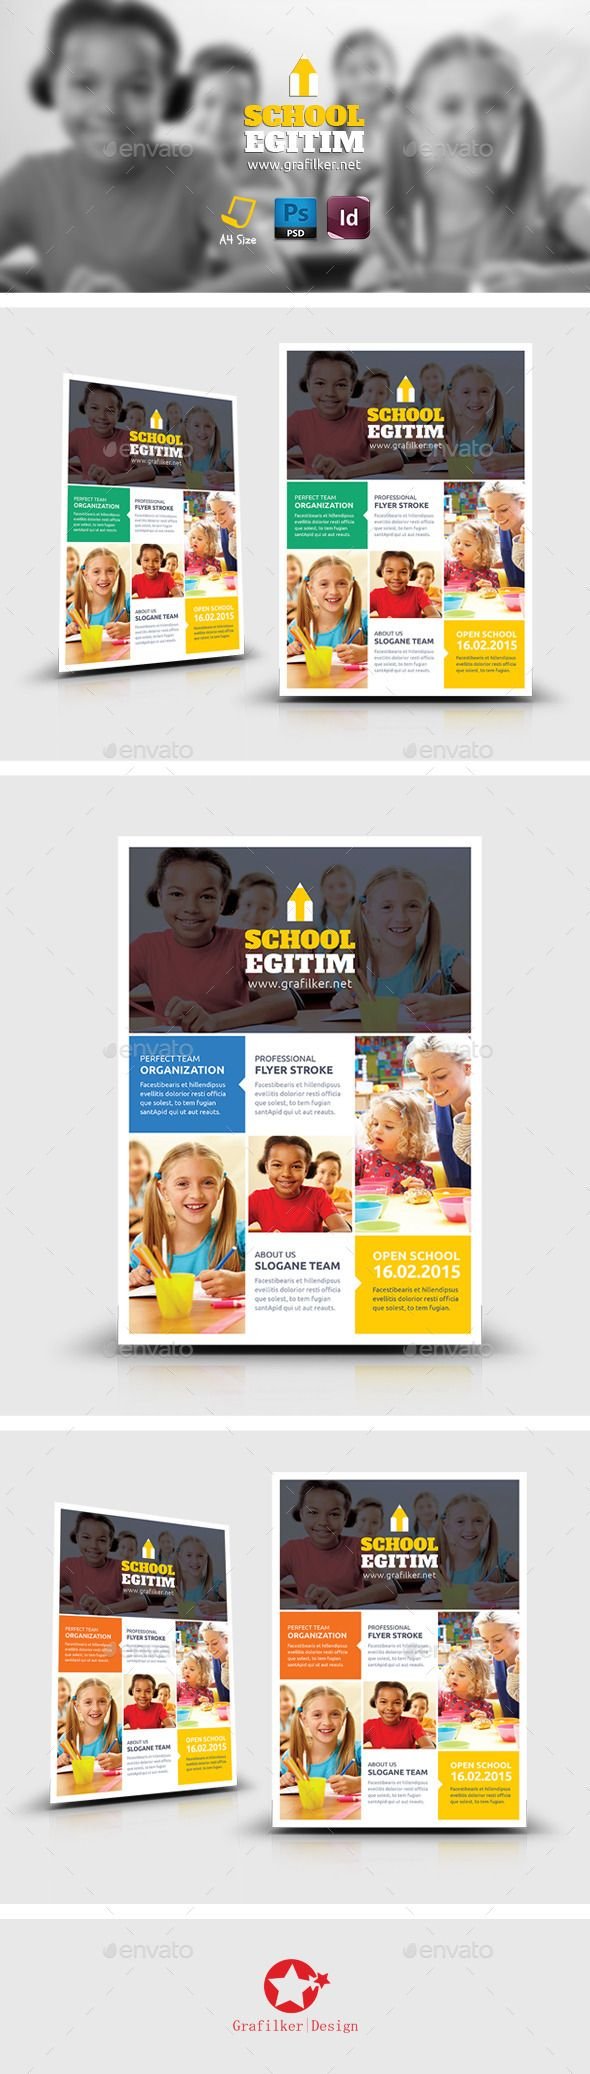 baby toddler child day care design brochures kids school flyer templates